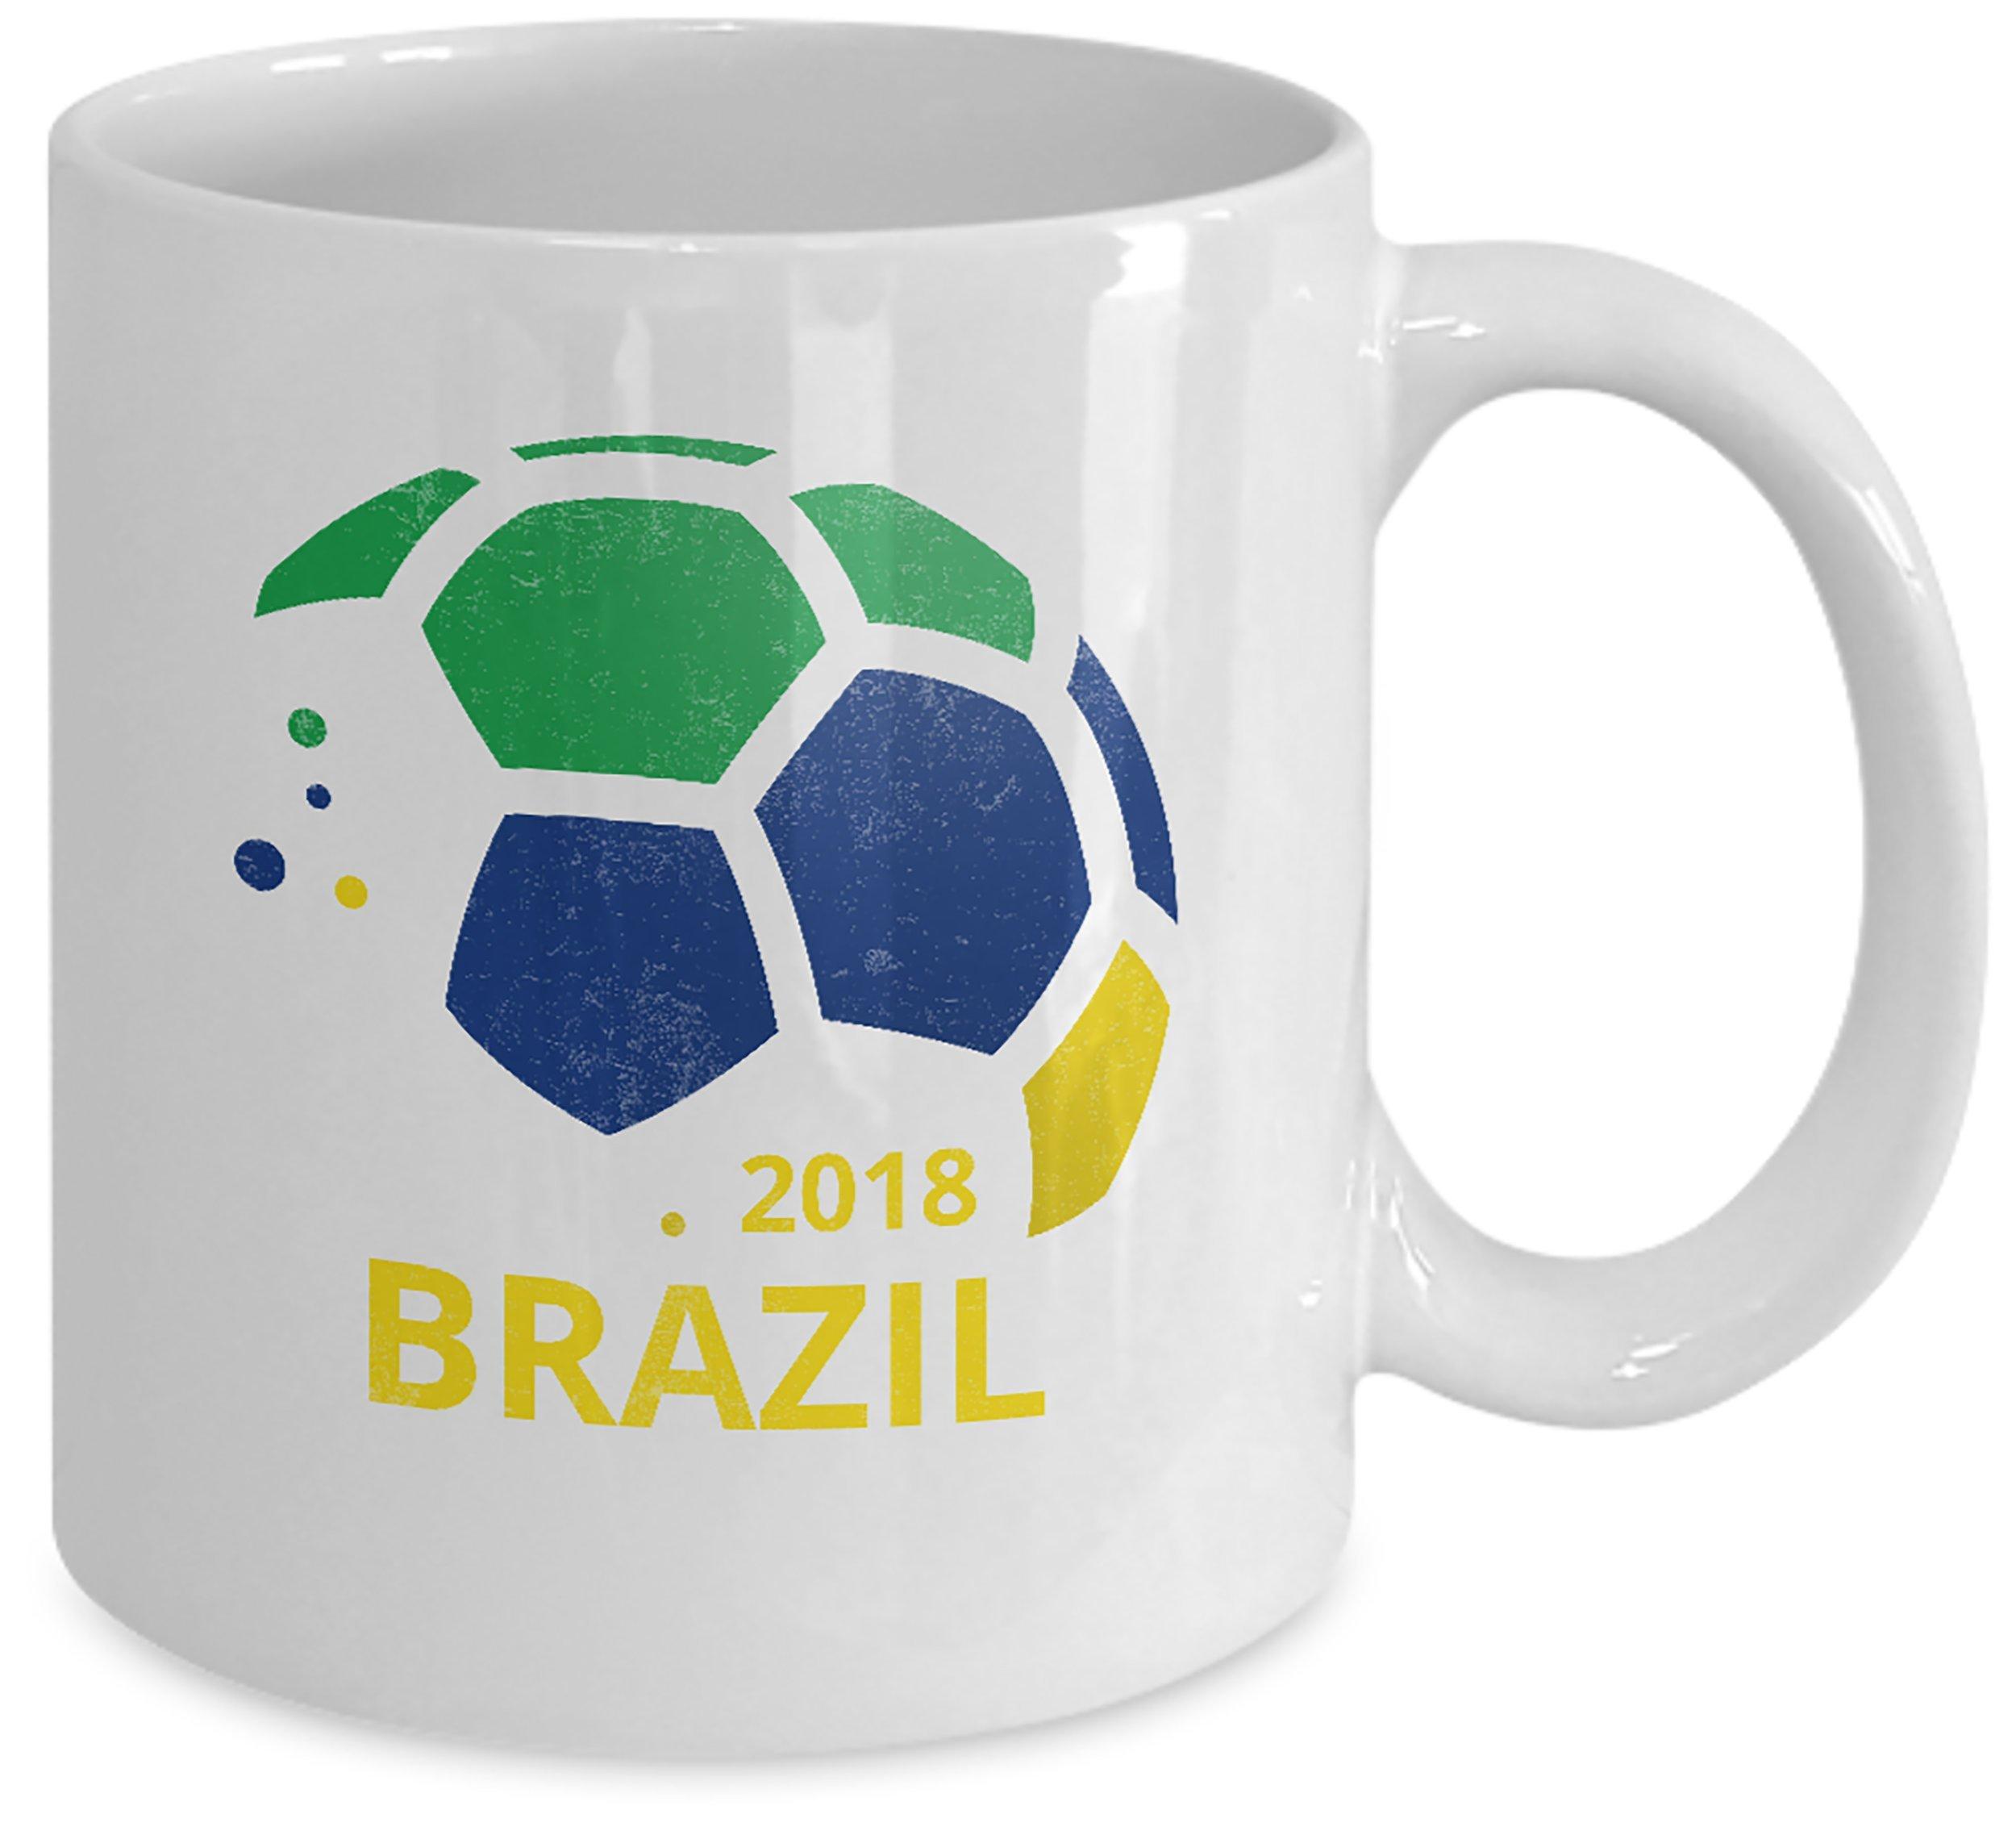 Brazil Soccer Team Coffee Mug - 11oz White Ceramic Tea Cup. World Futbol Country Flag Pride Novelty Gift. Set of 1.